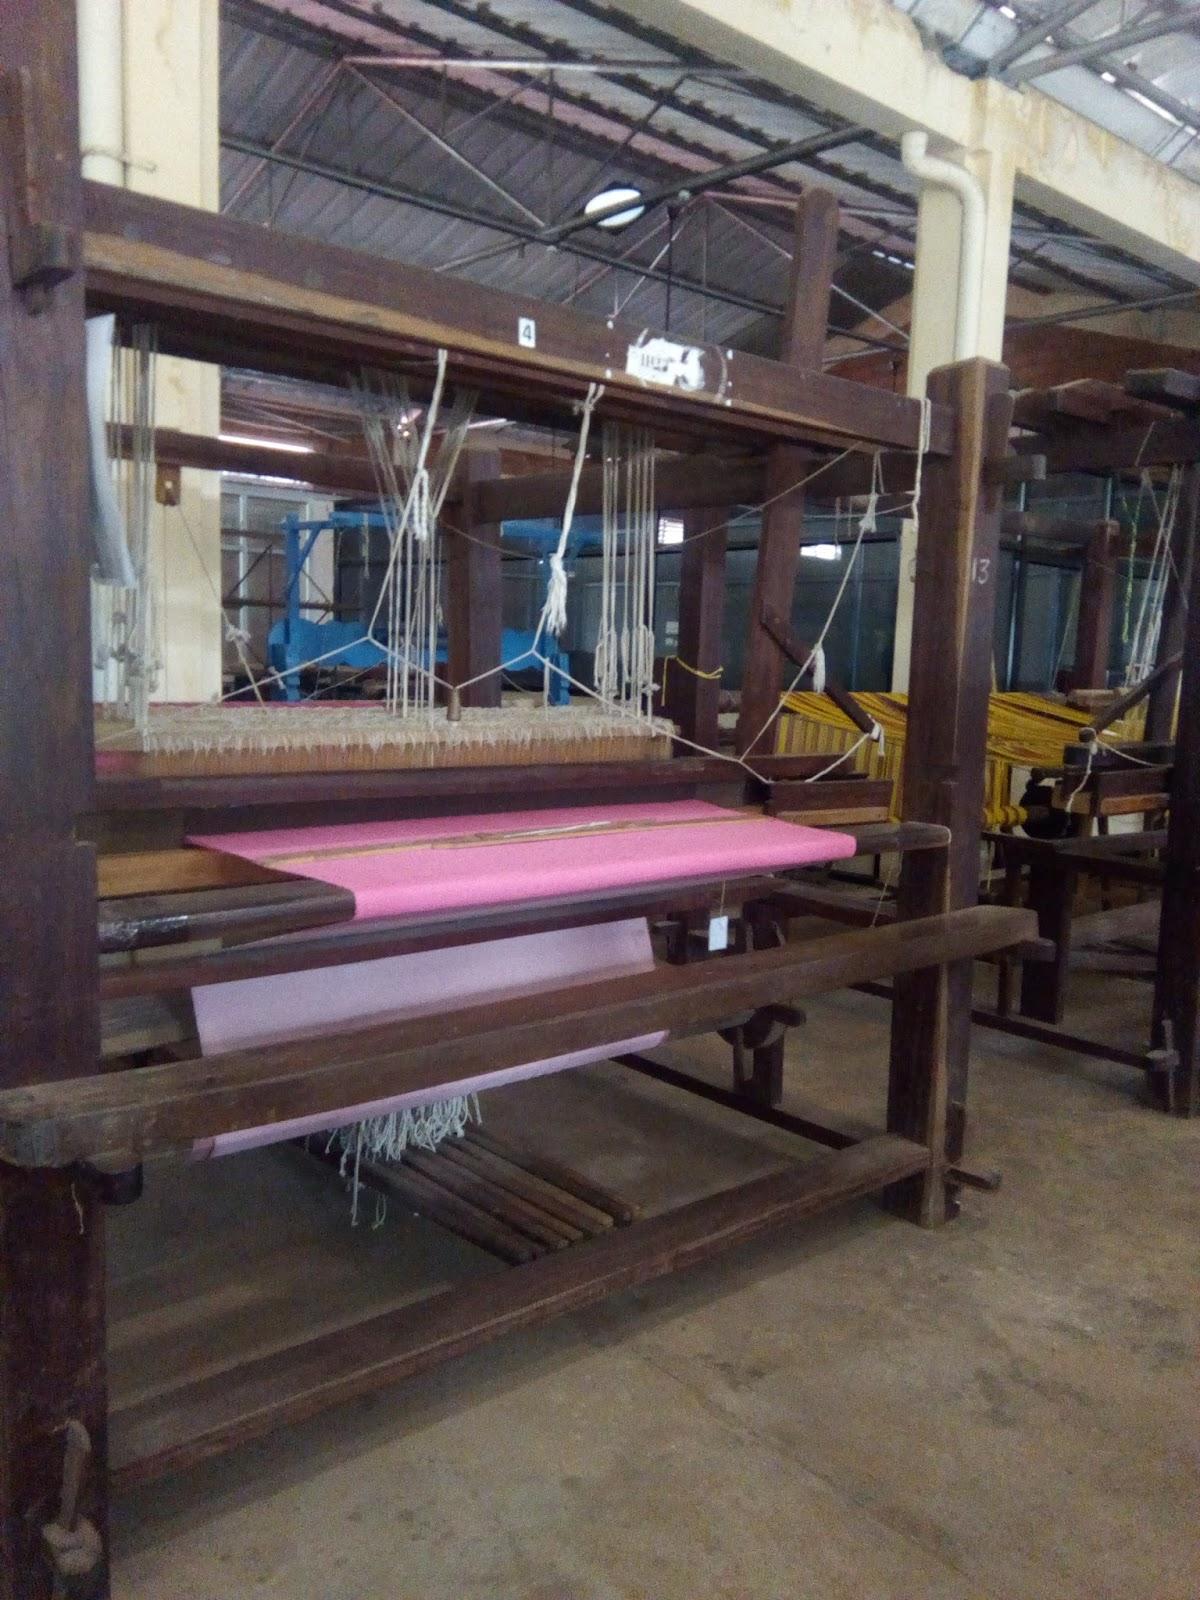 Handloom technology: Functions of handloom parts